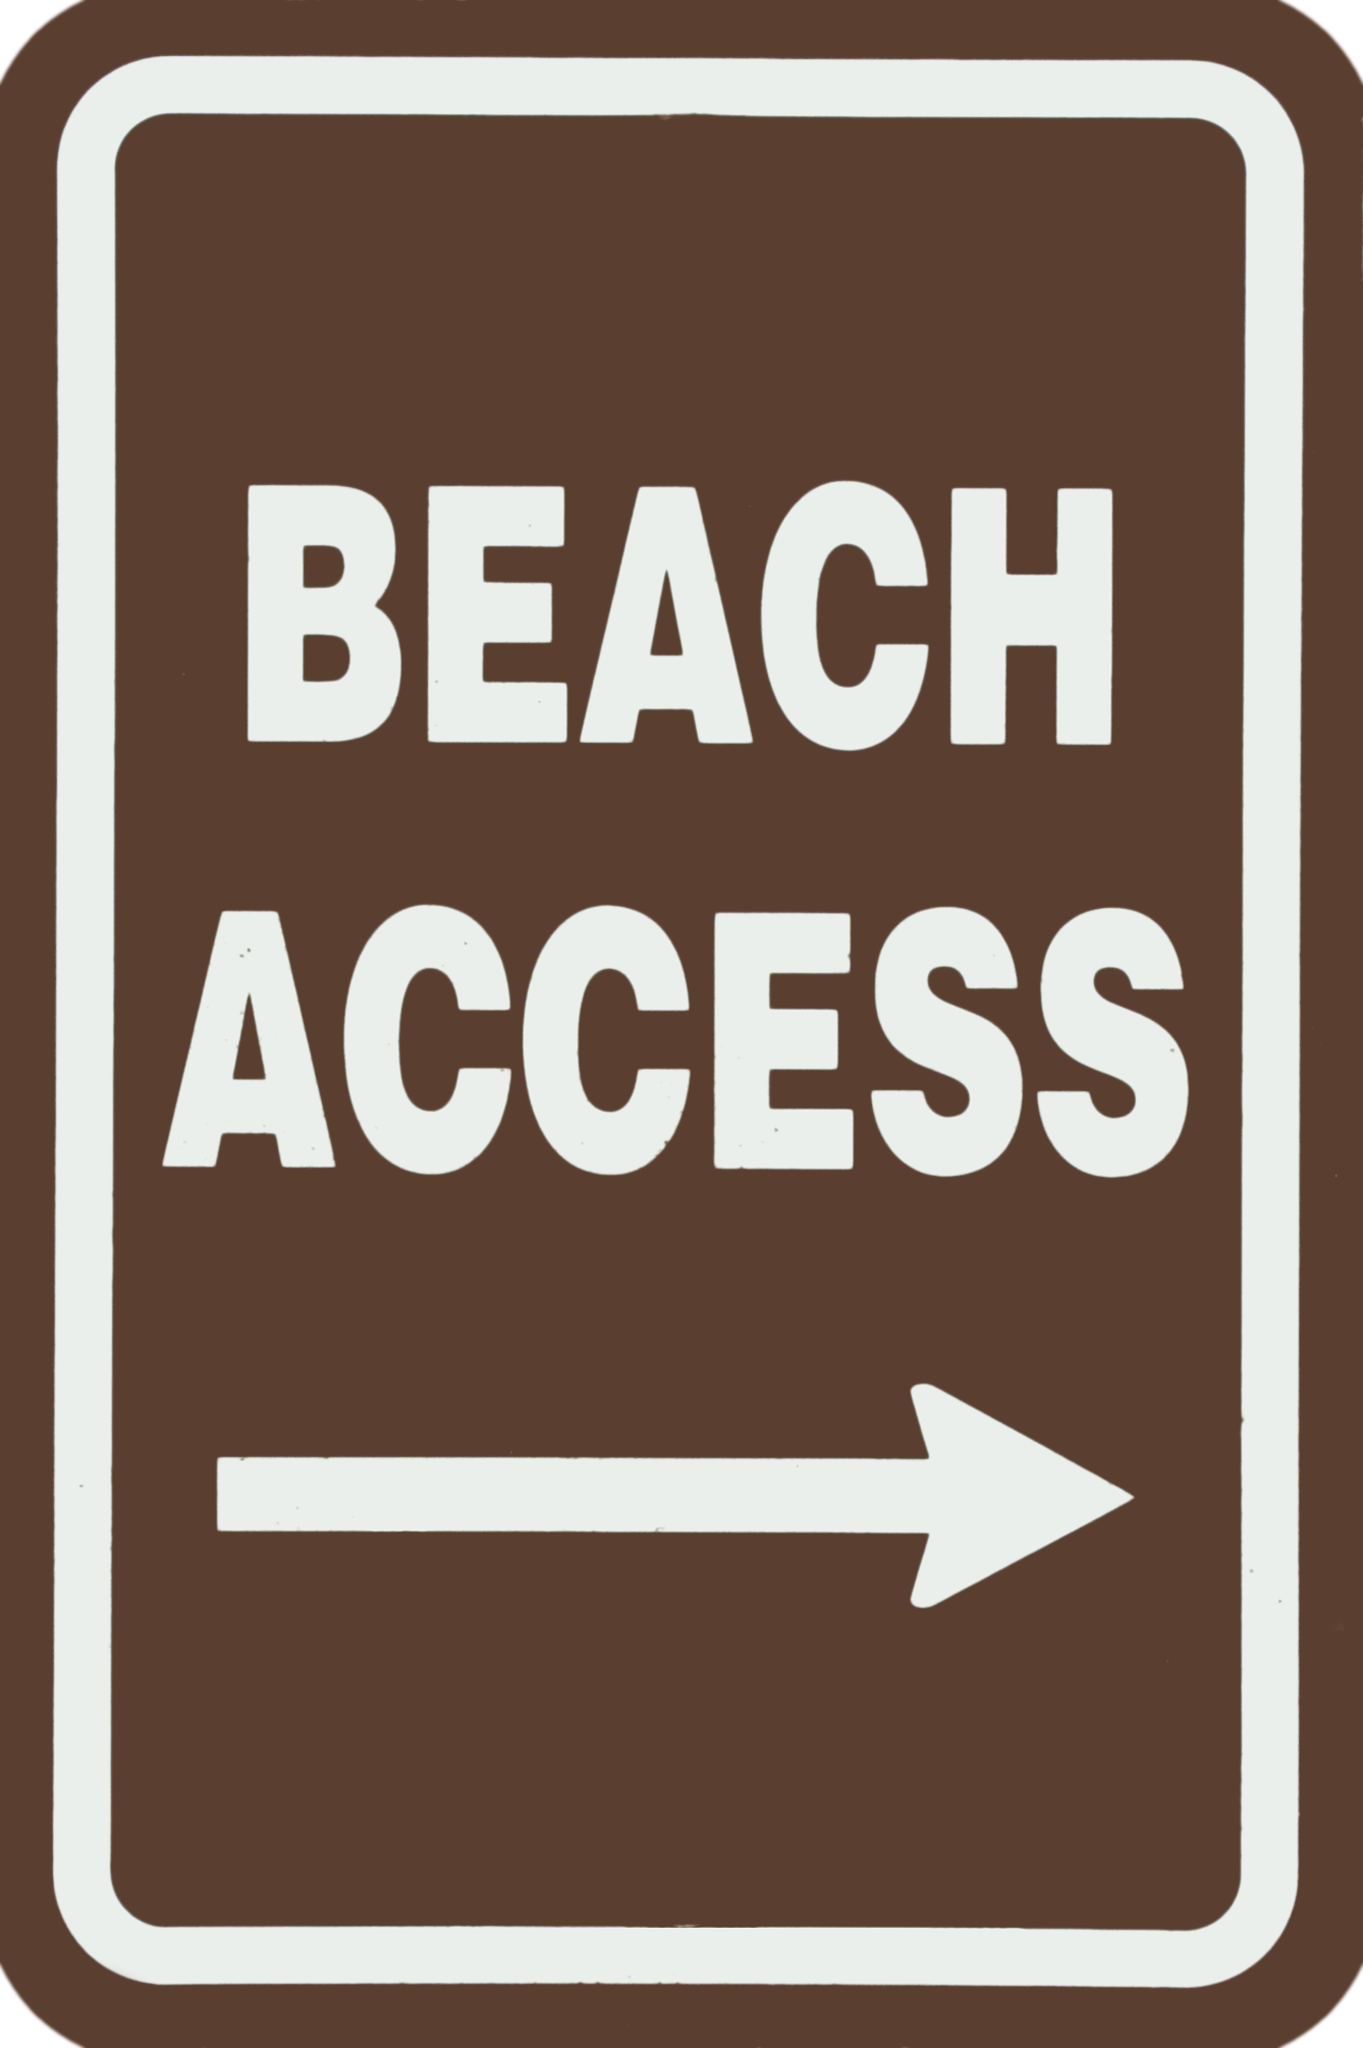 Beach Access.png